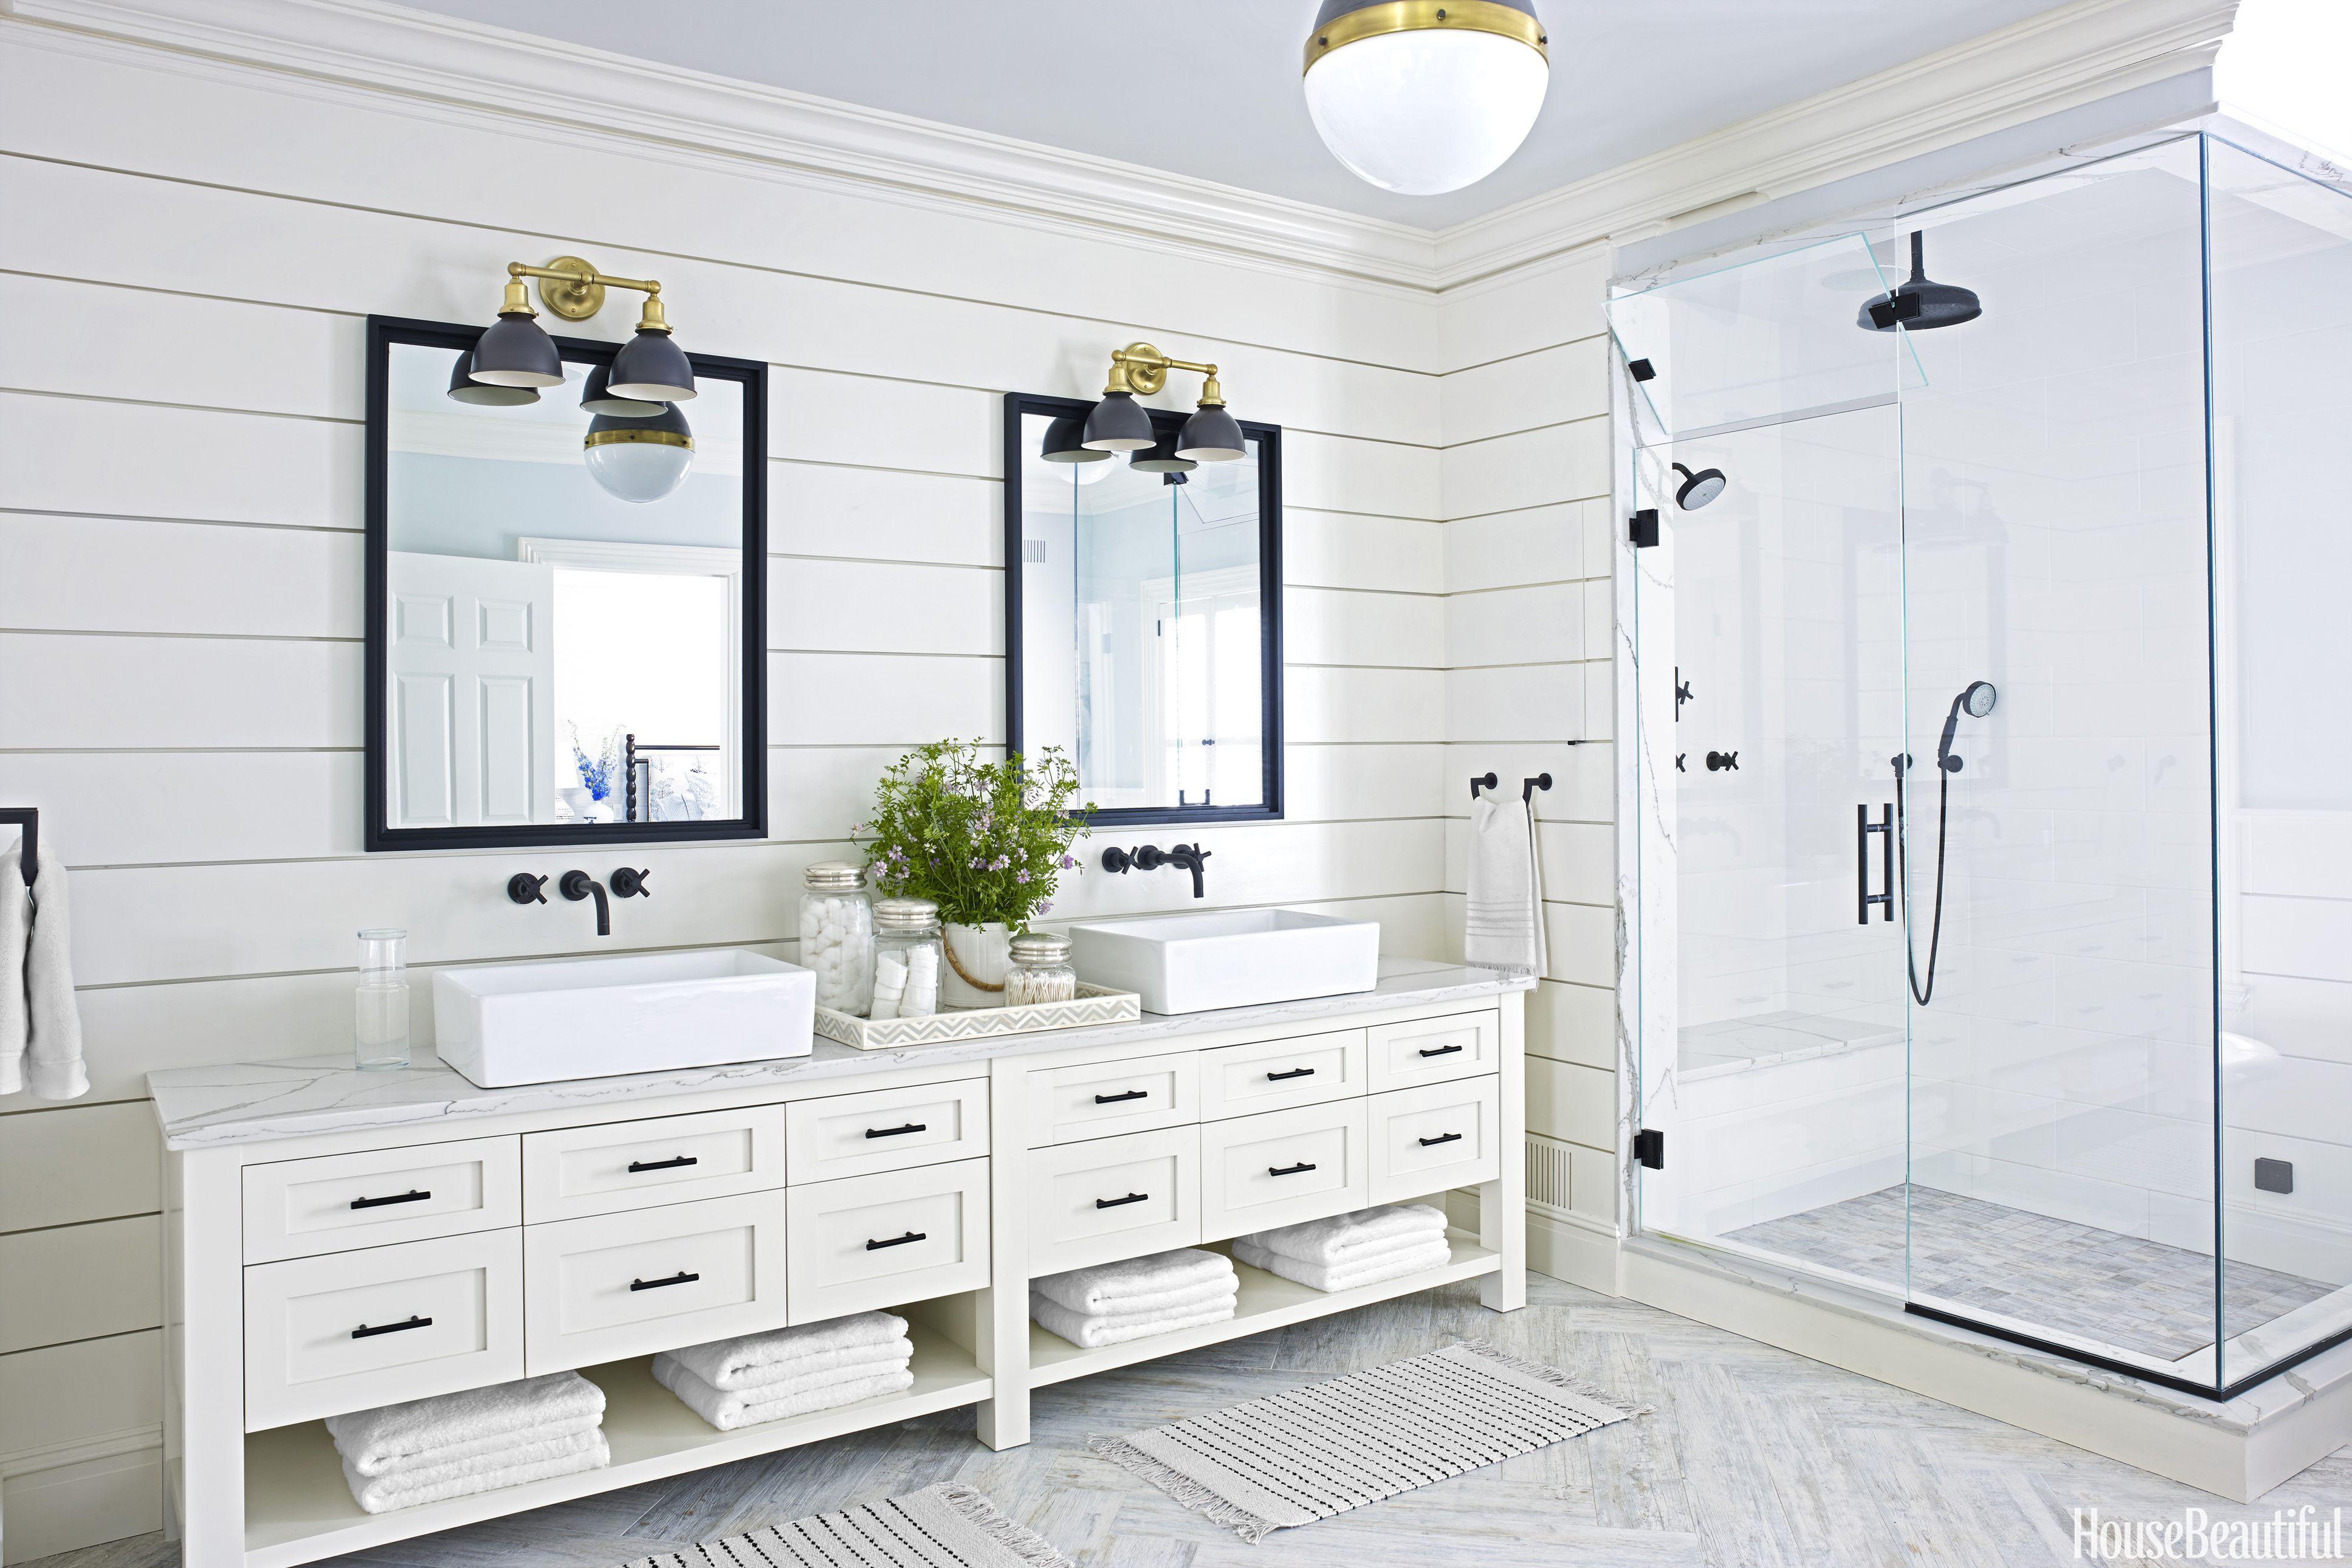 15 genius under sink organizers your bathroom and kitchen needs